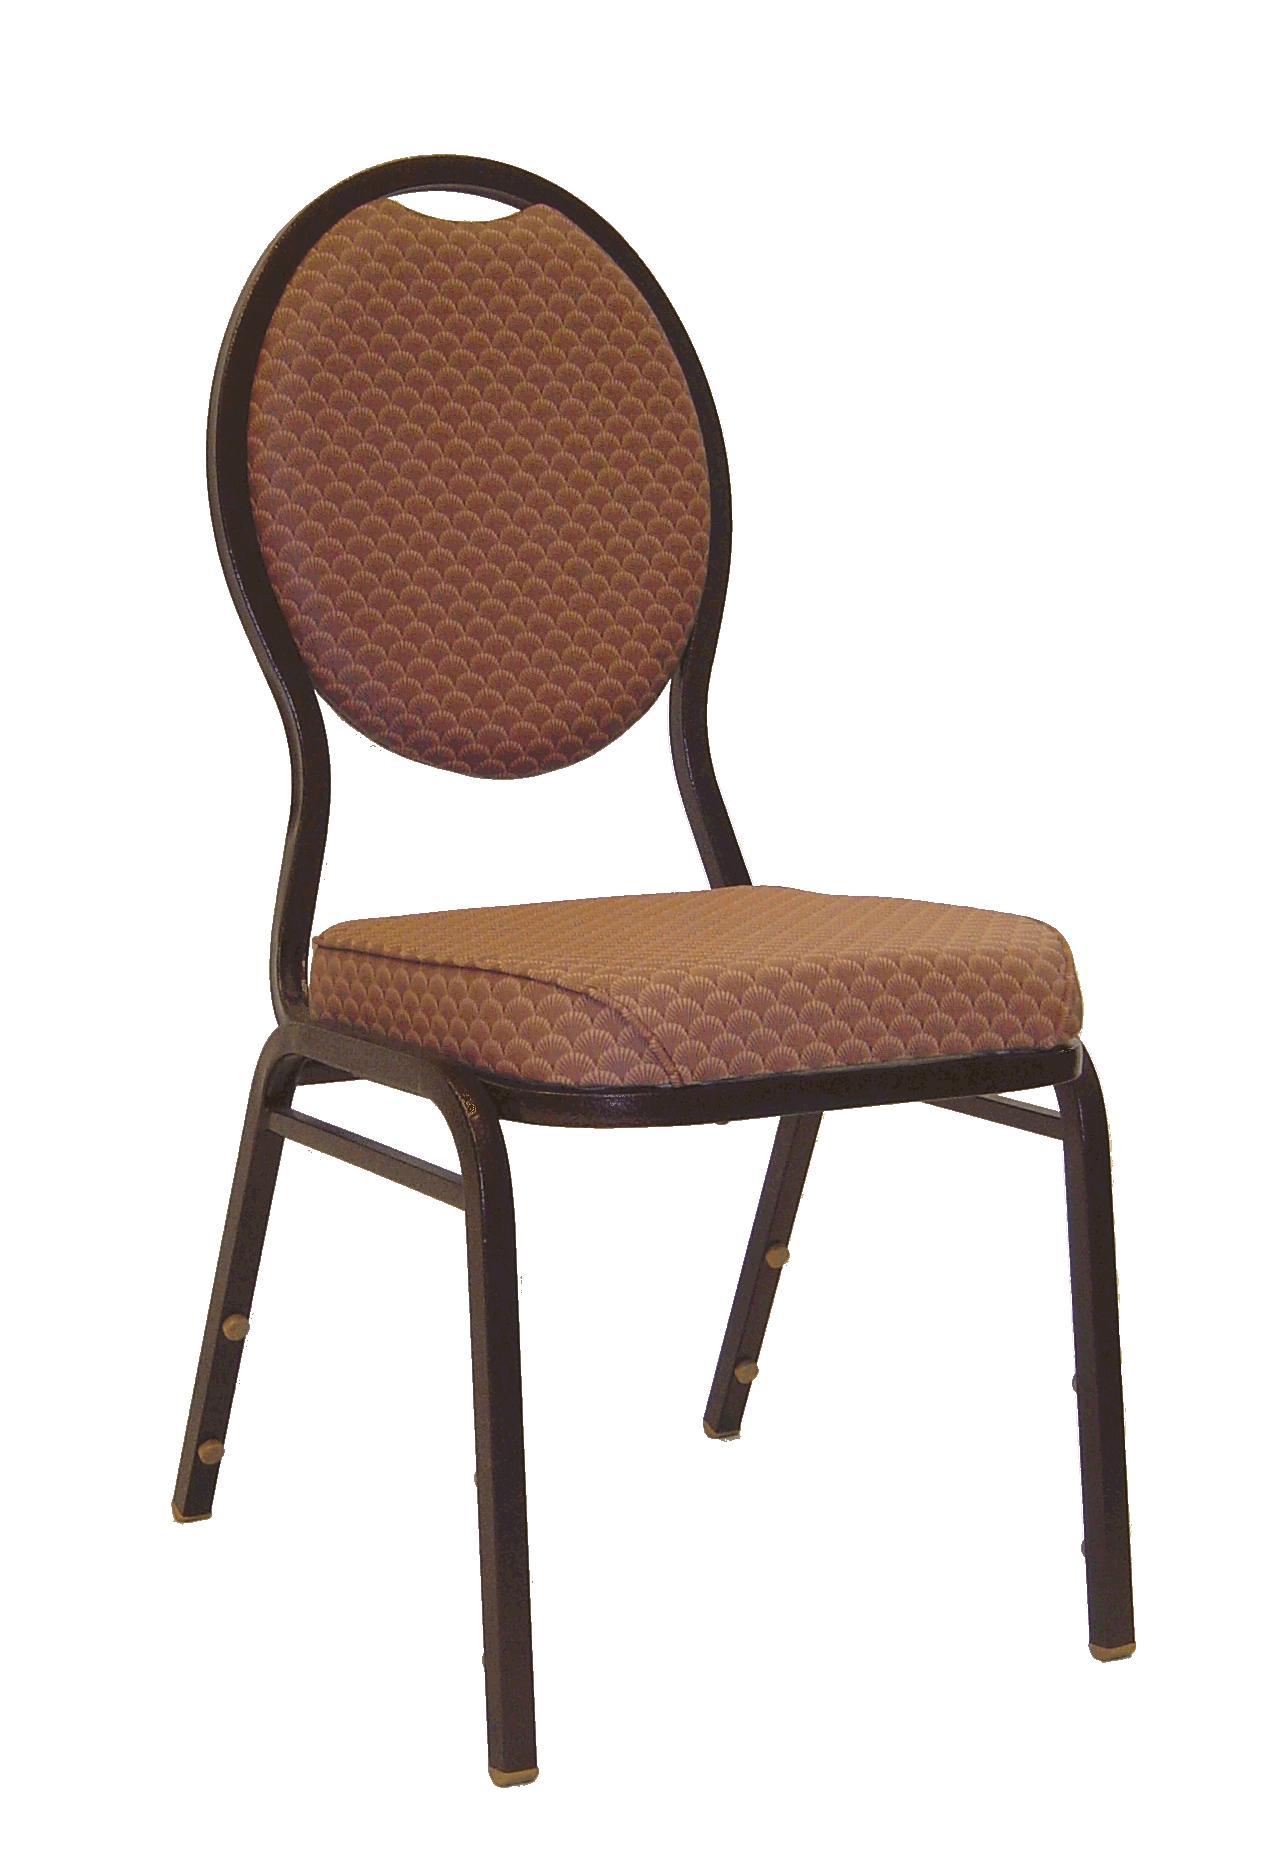 Chair Collection Com Banquet Halls